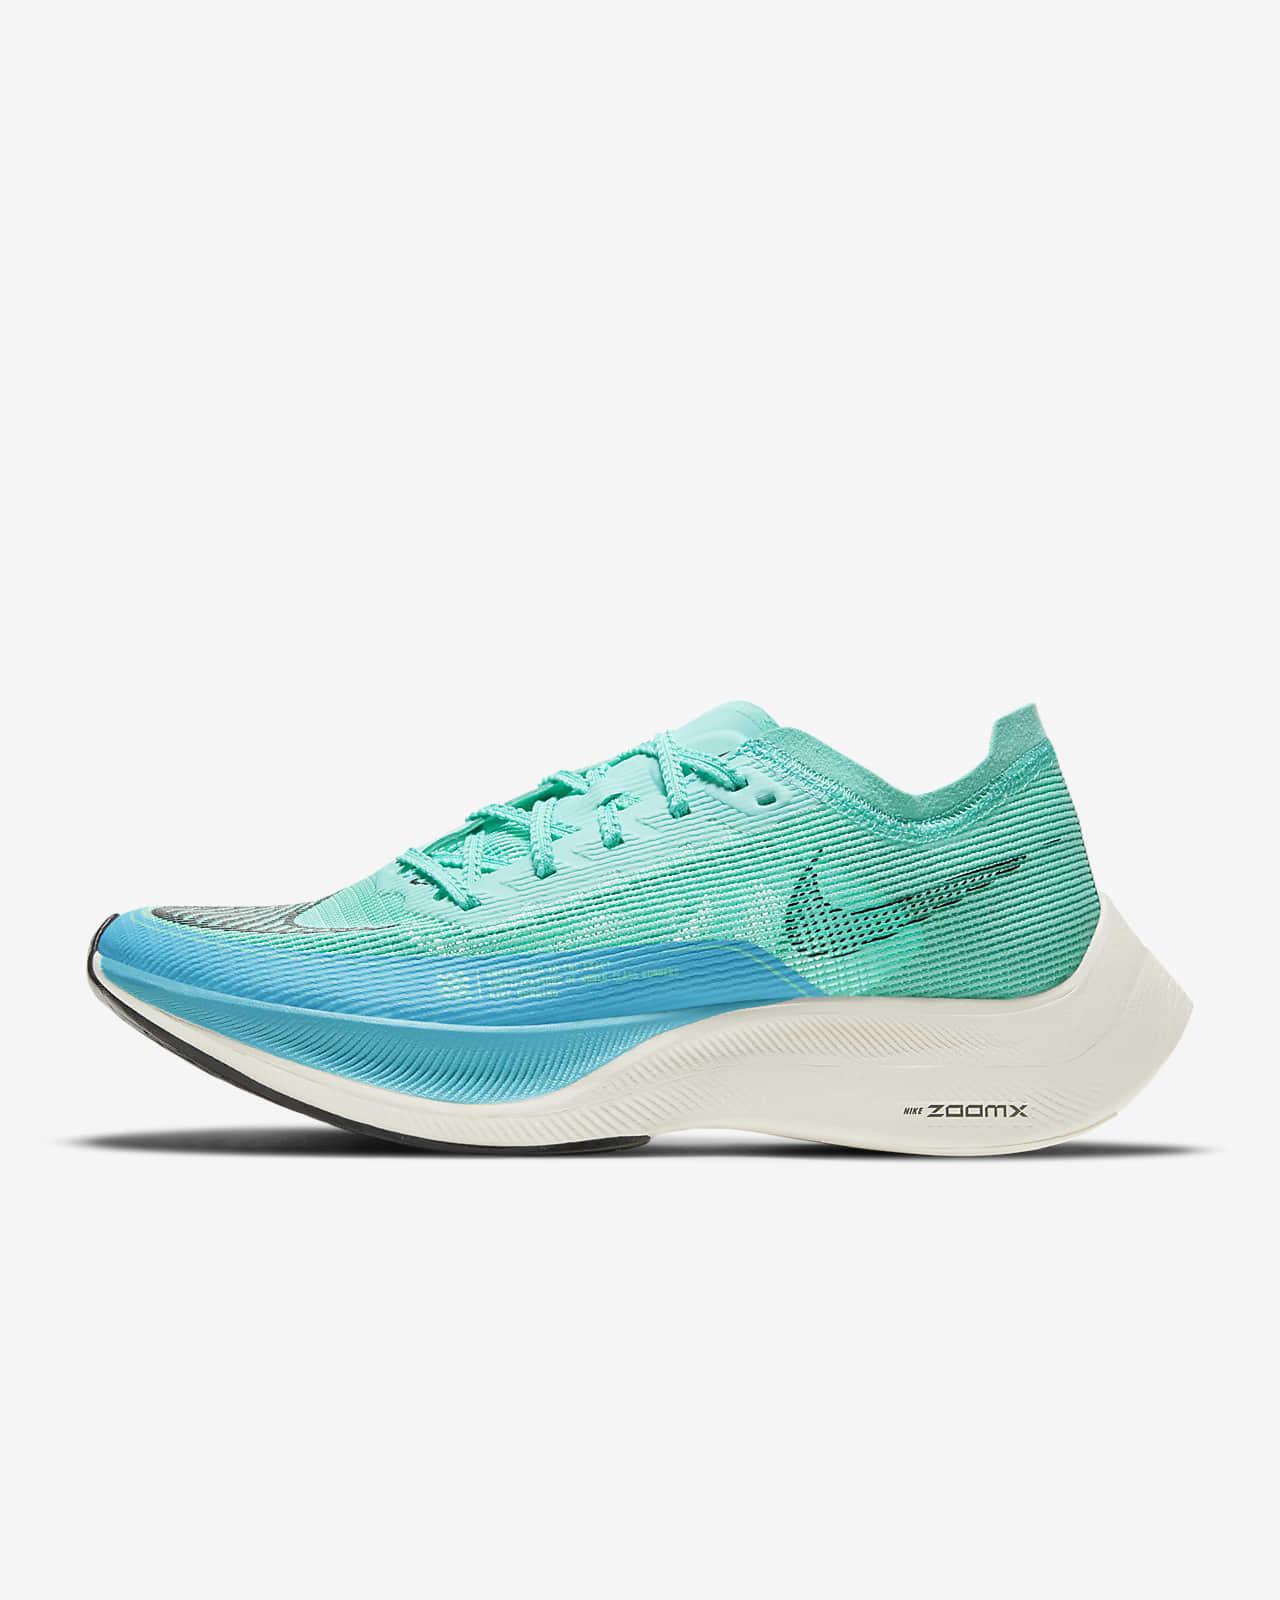 Scarpa da gara Nike ZoomX Vaporfly Next% 2 - Donna